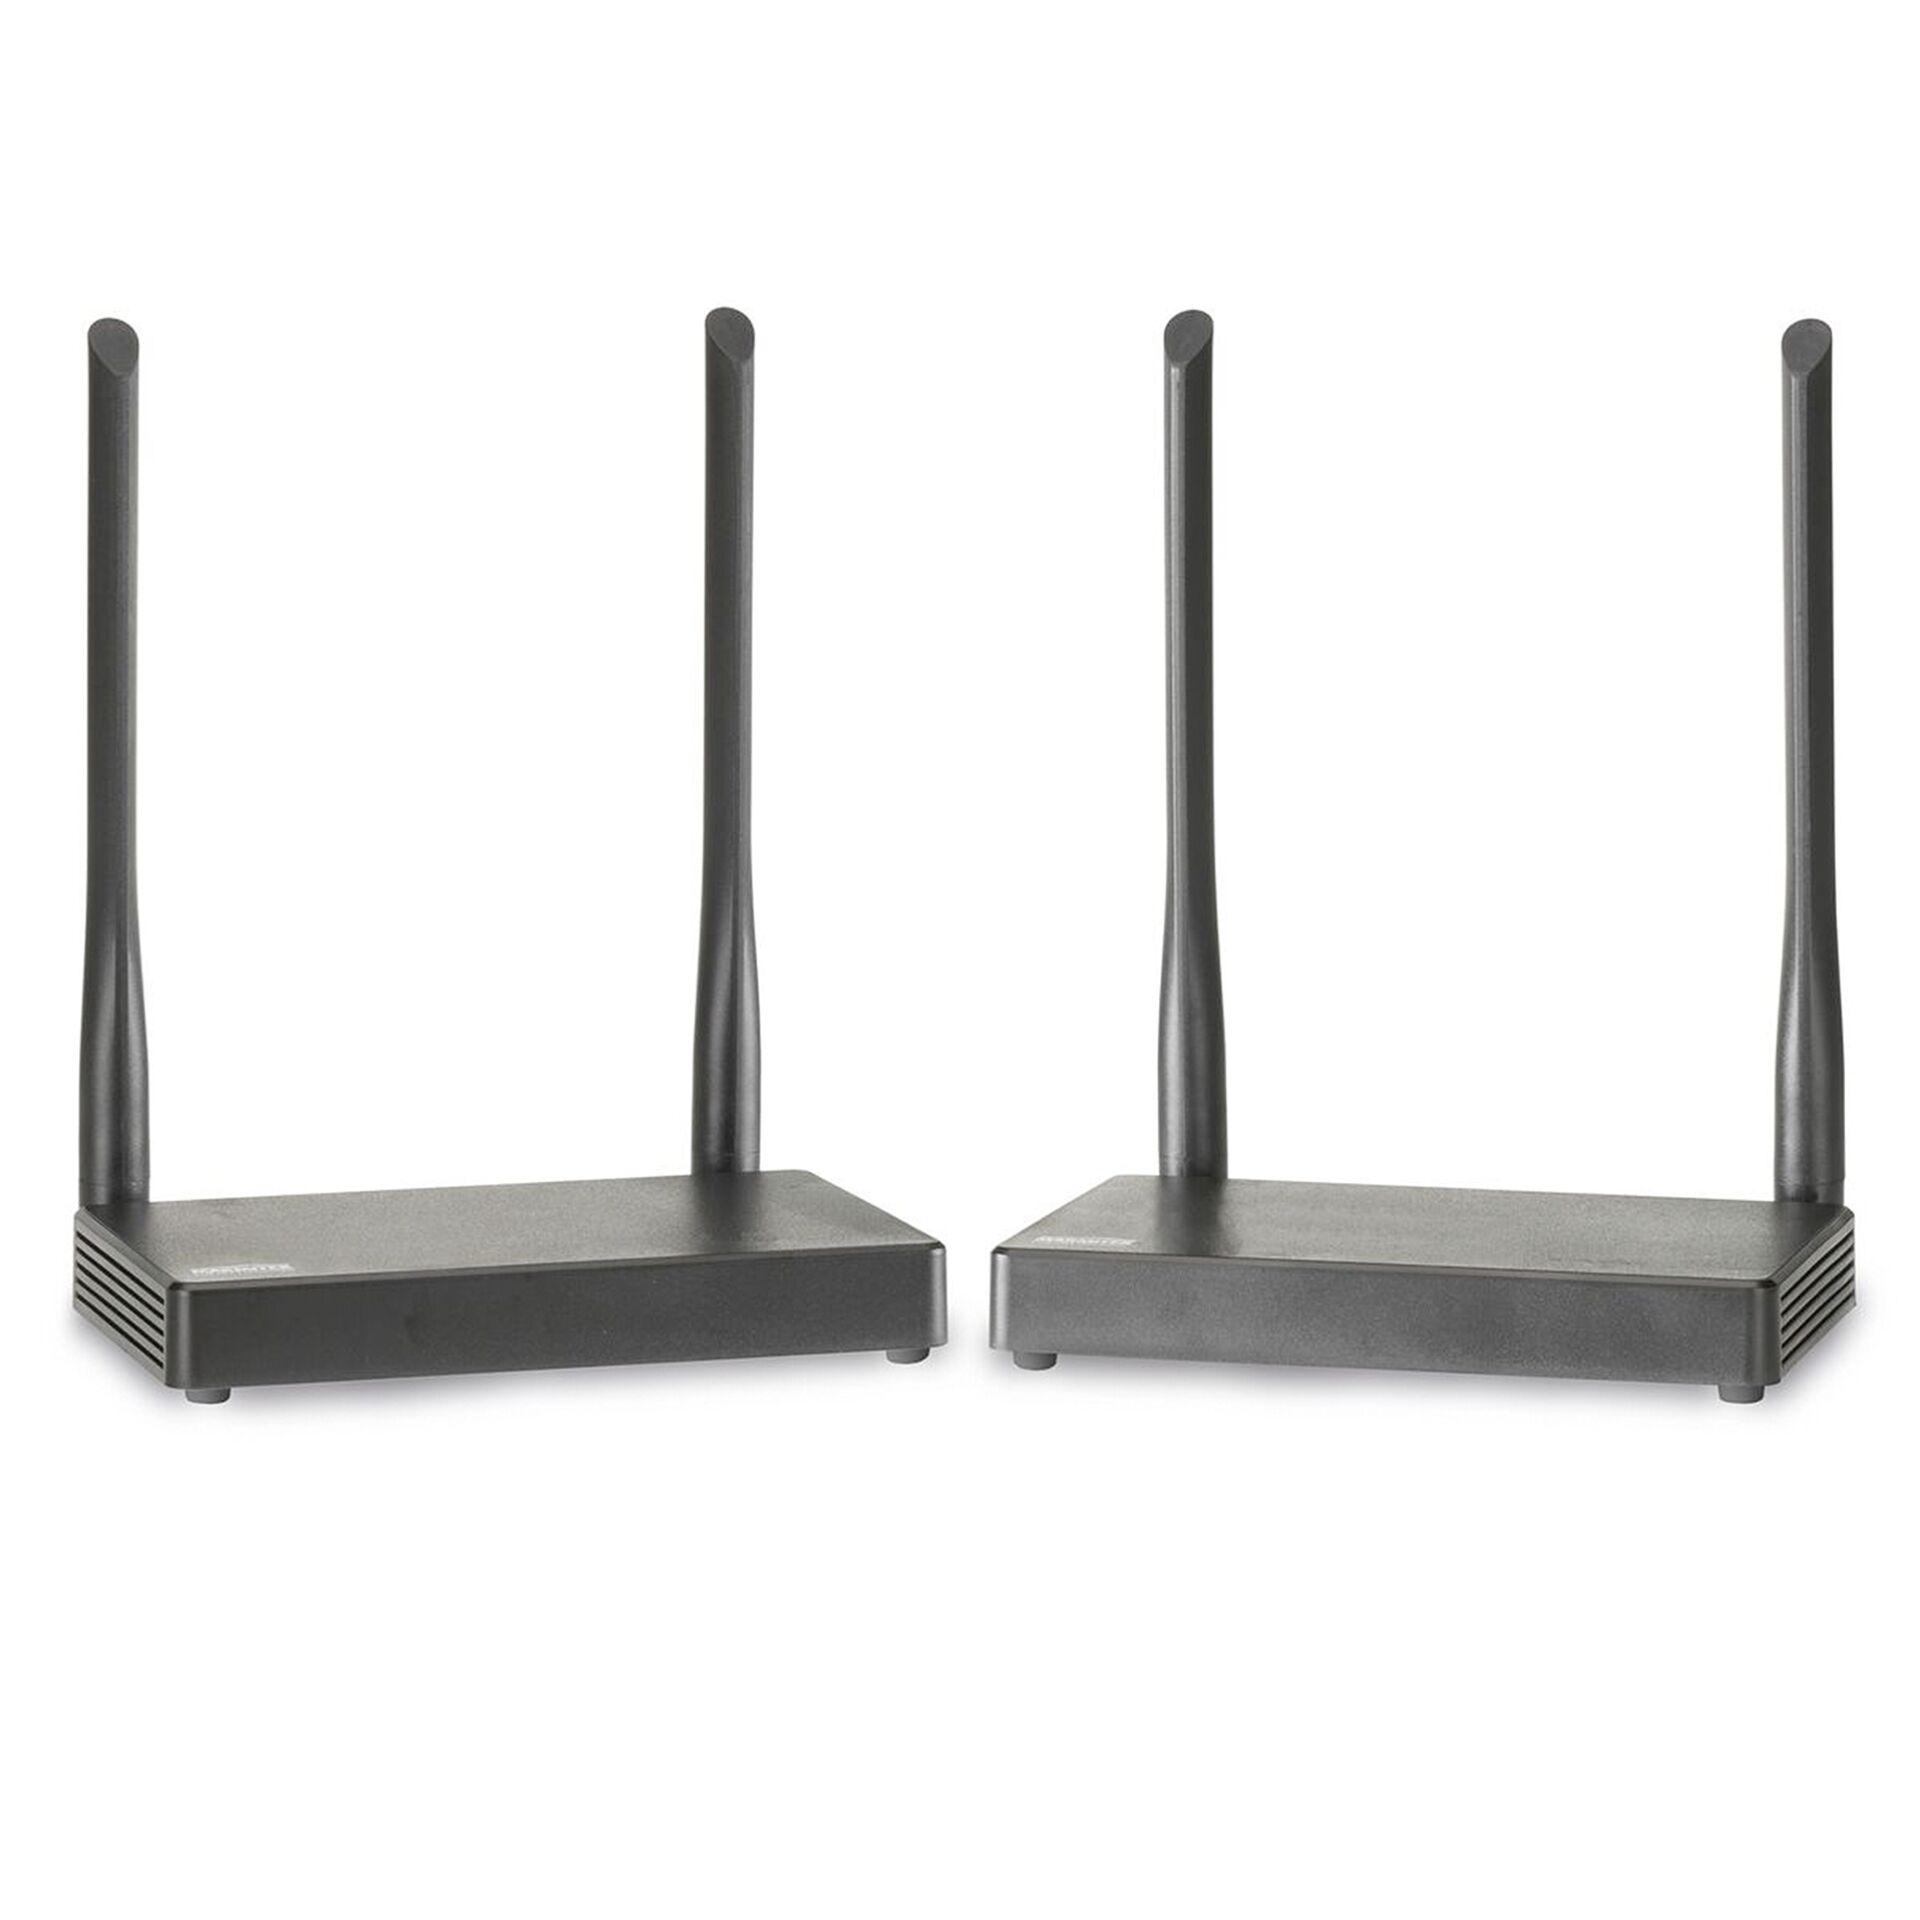 Marmitek HDMI Extender drahtlos Full HD TV Anywhere Wireless HD